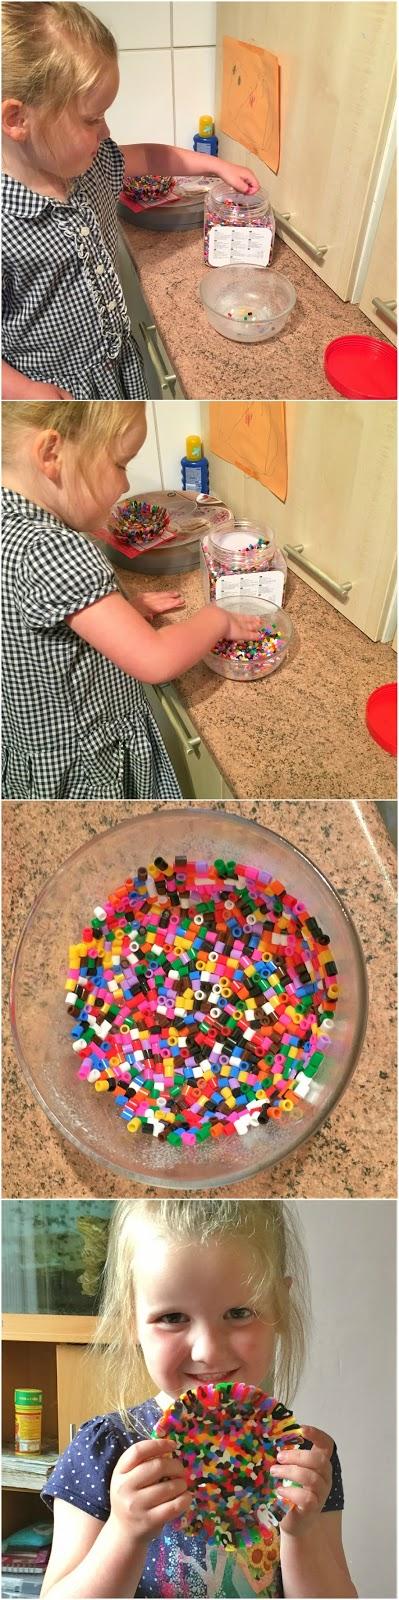 Summer making her bowls